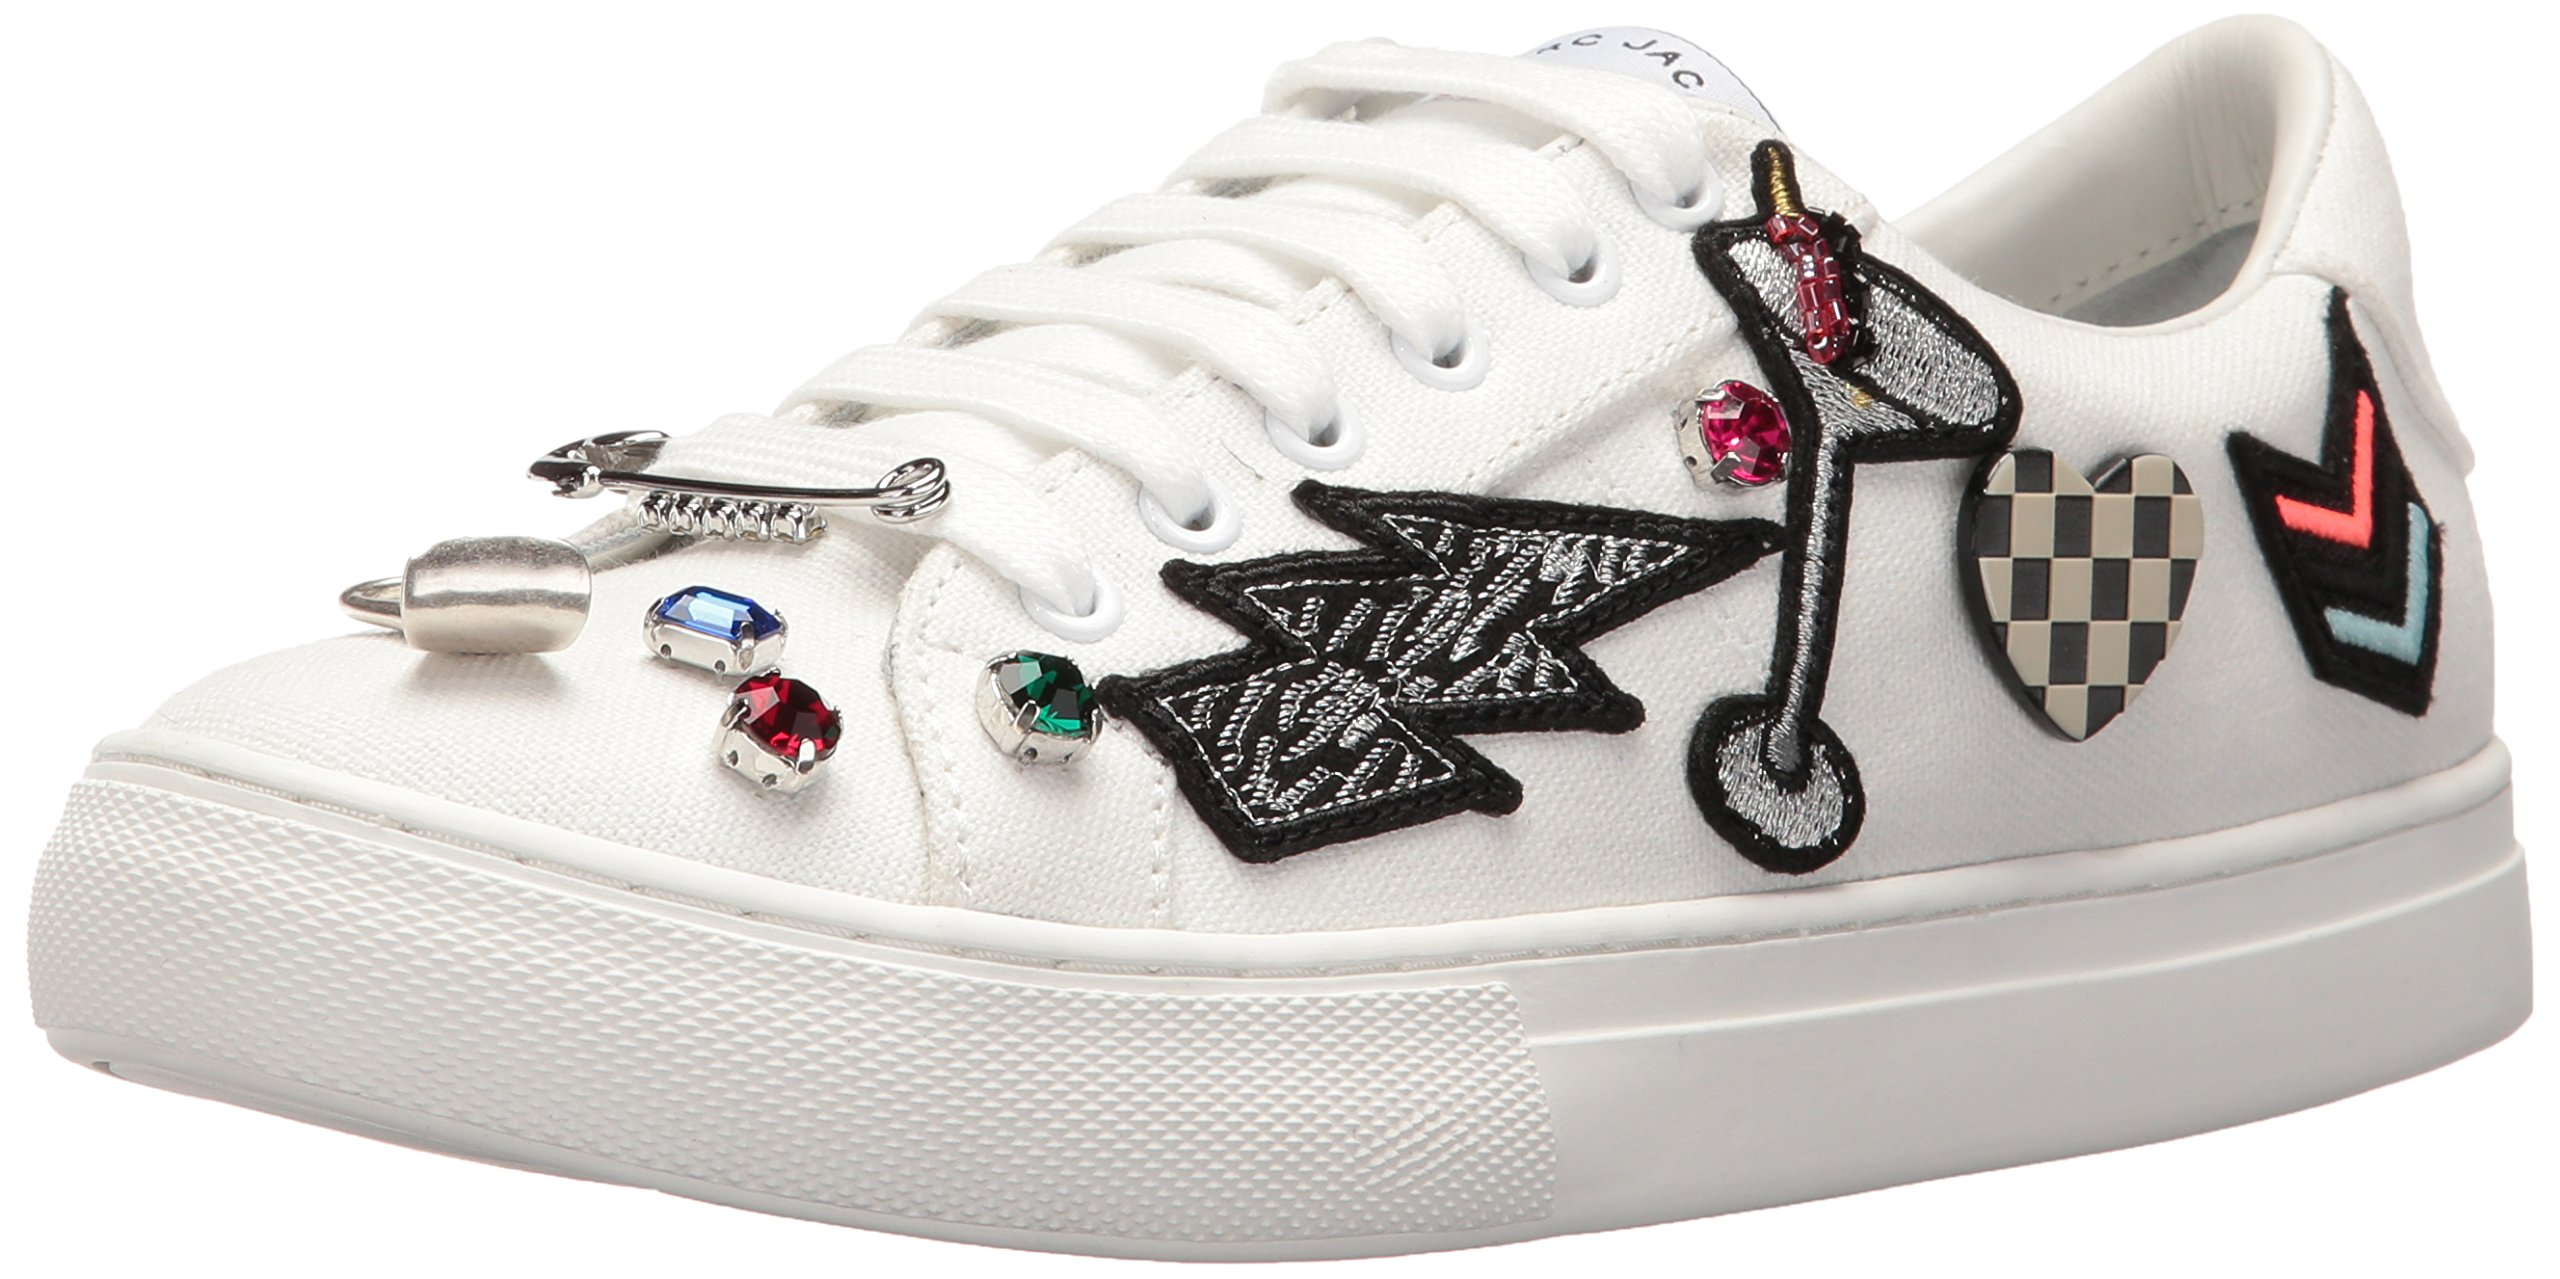 Marc Jacobs Women's Empire Lace up Fashion Sneaker, White Multi, 40 EU/10 M US